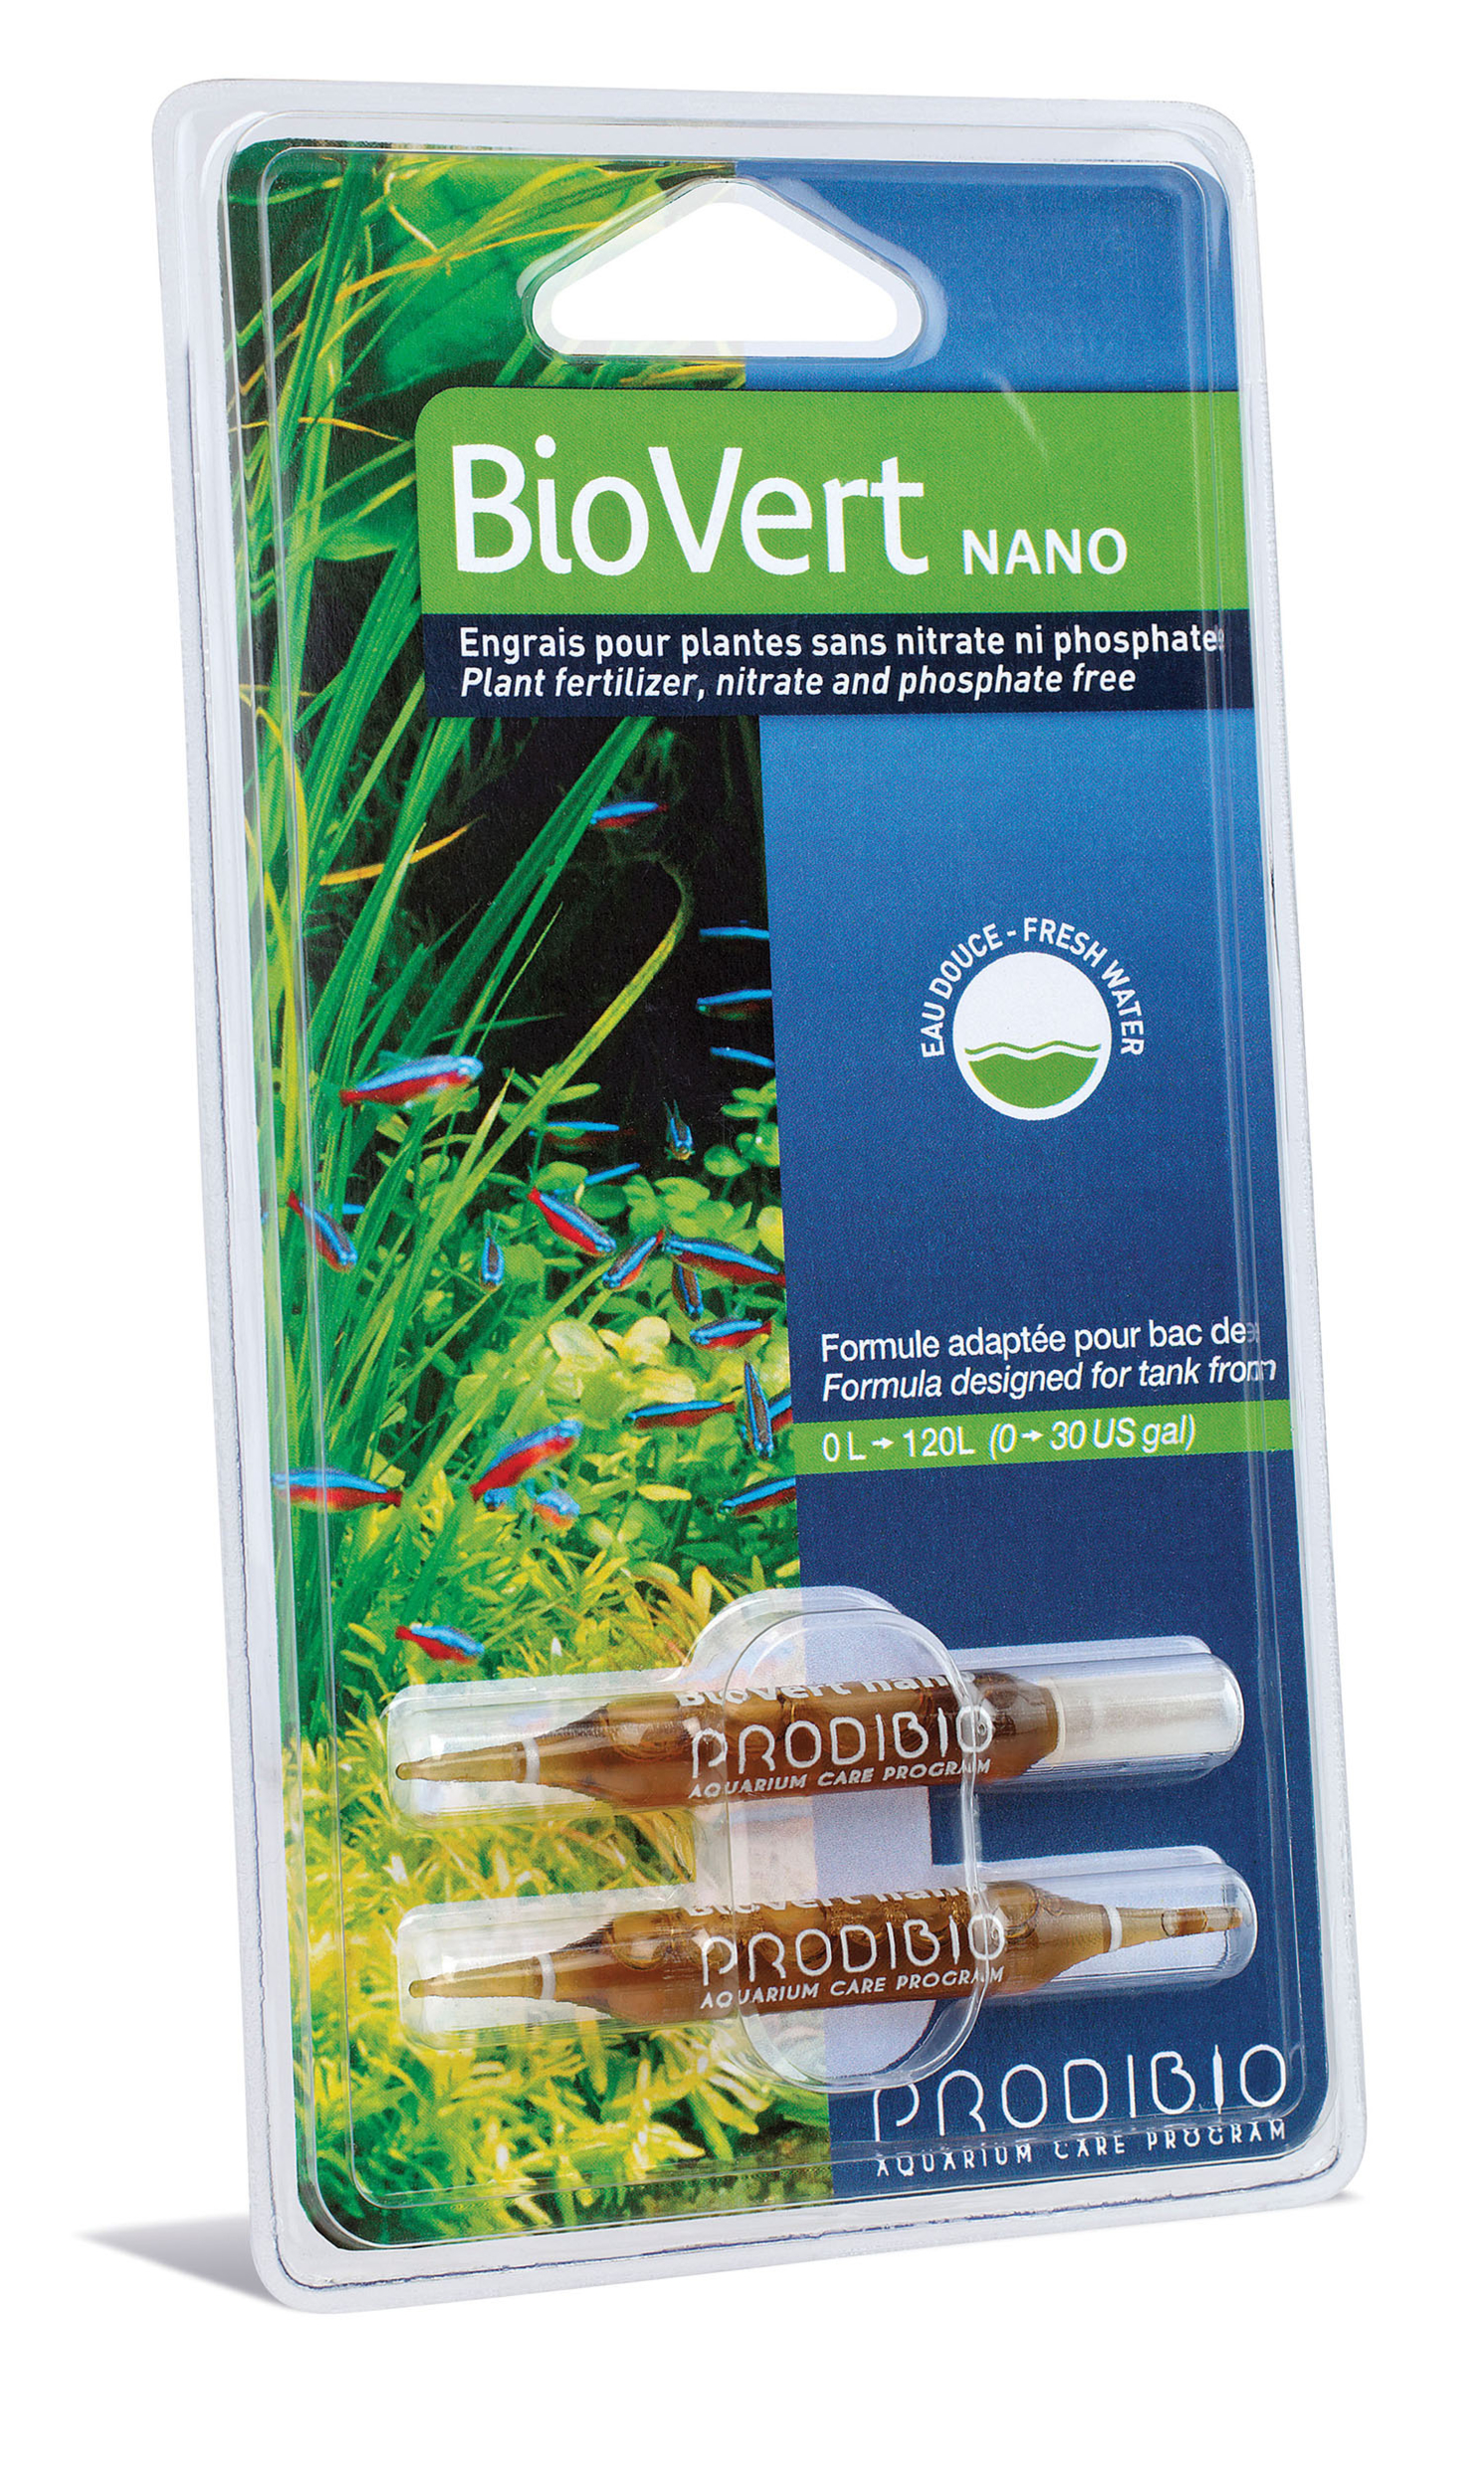 biovert_blister_-_2_-_prodibio